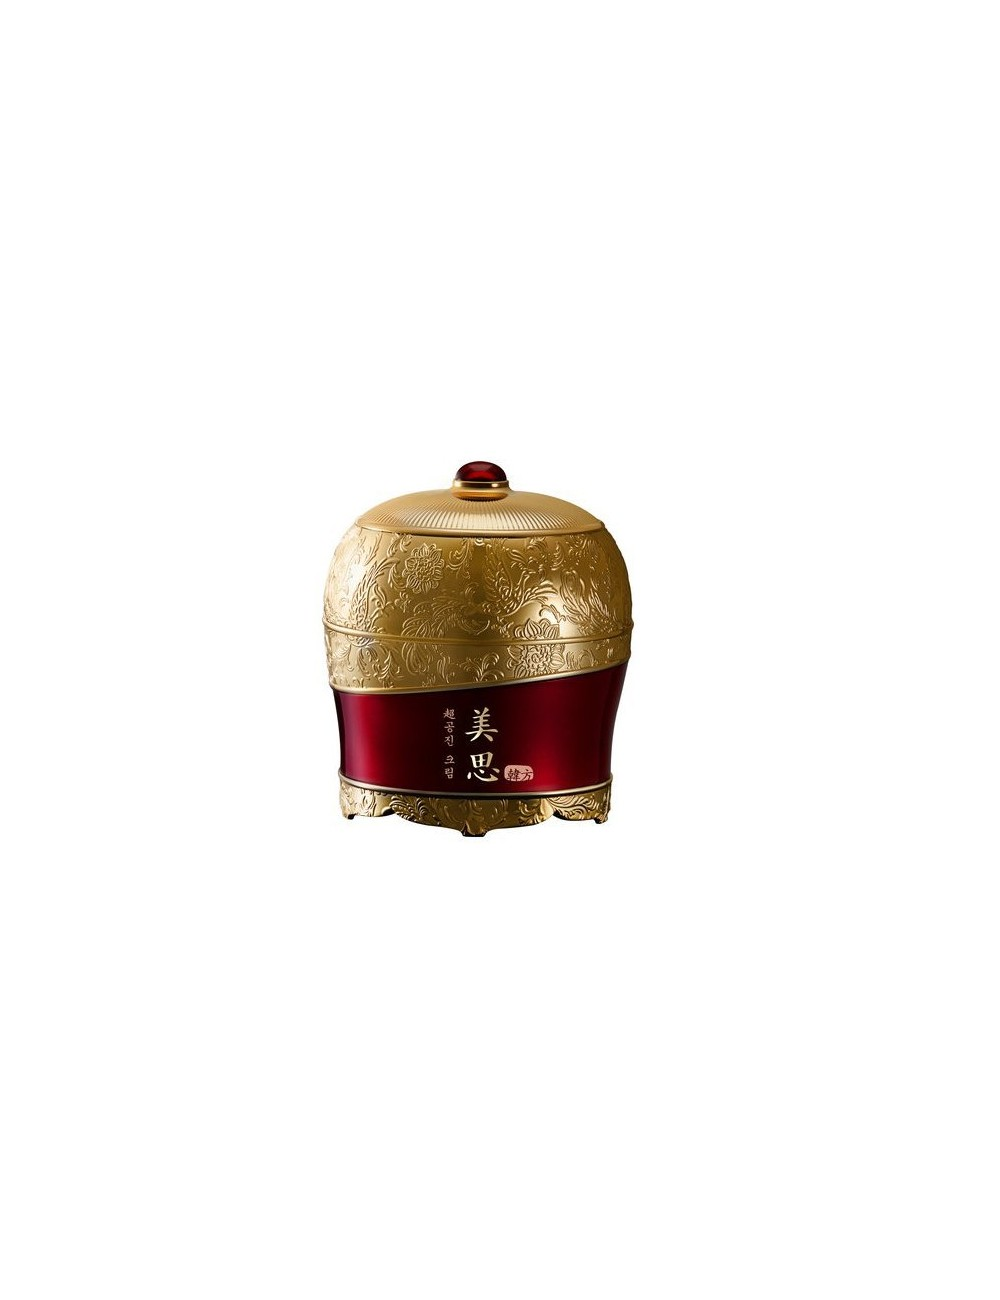 Crema Anti Edad MISSHA MISA Cho Gong Jin Cream